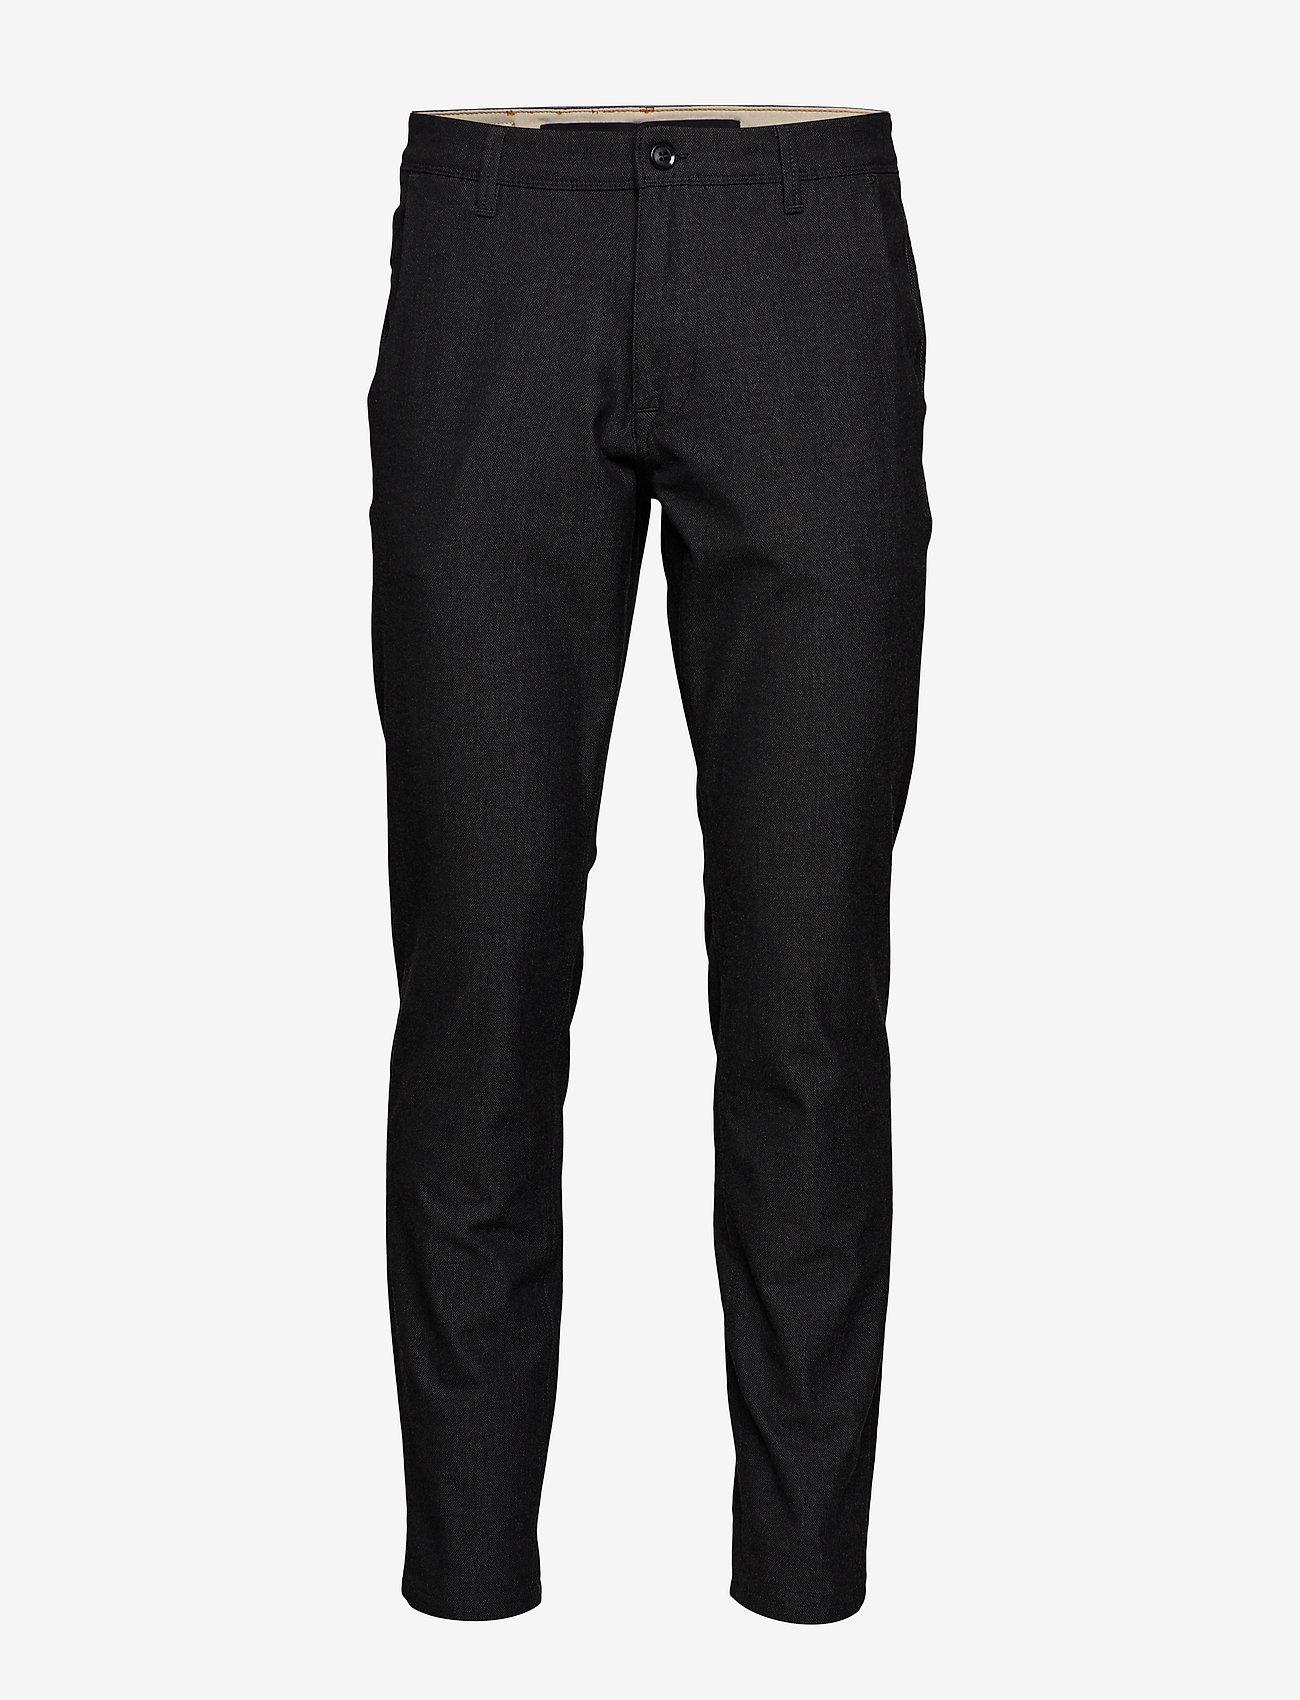 Selected Homme - SLHSLIM-STORM FLEX SMART PANTS W NOOS - suitbukser - grey - 0